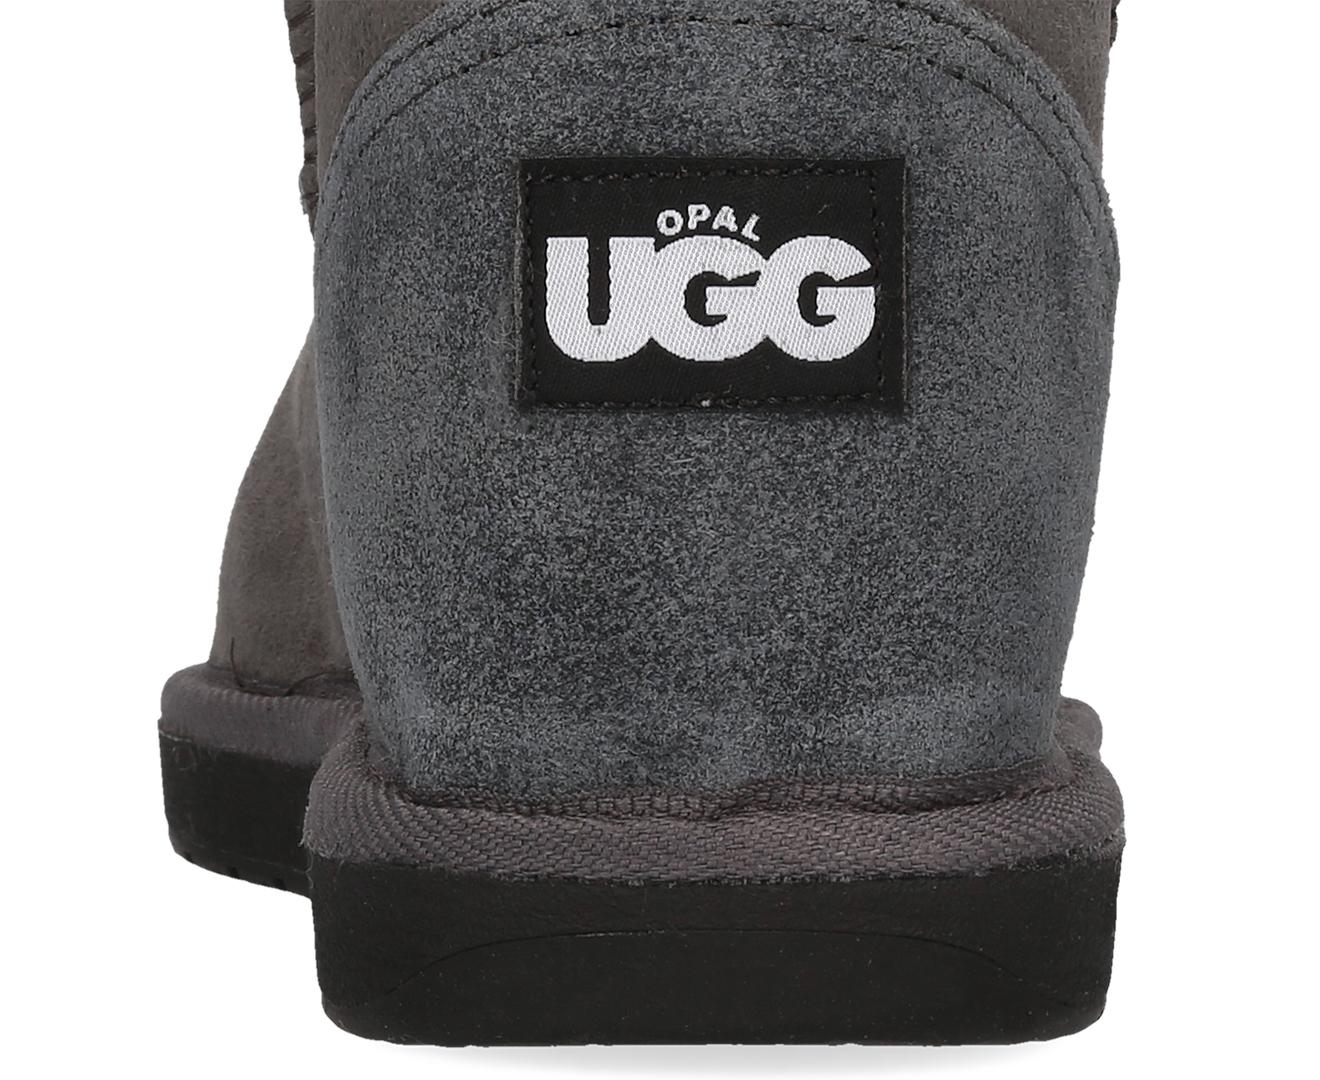 9840fbb3112 Opal UGG Australian Made Mini Opal Sheepskin Boots - Charcoal